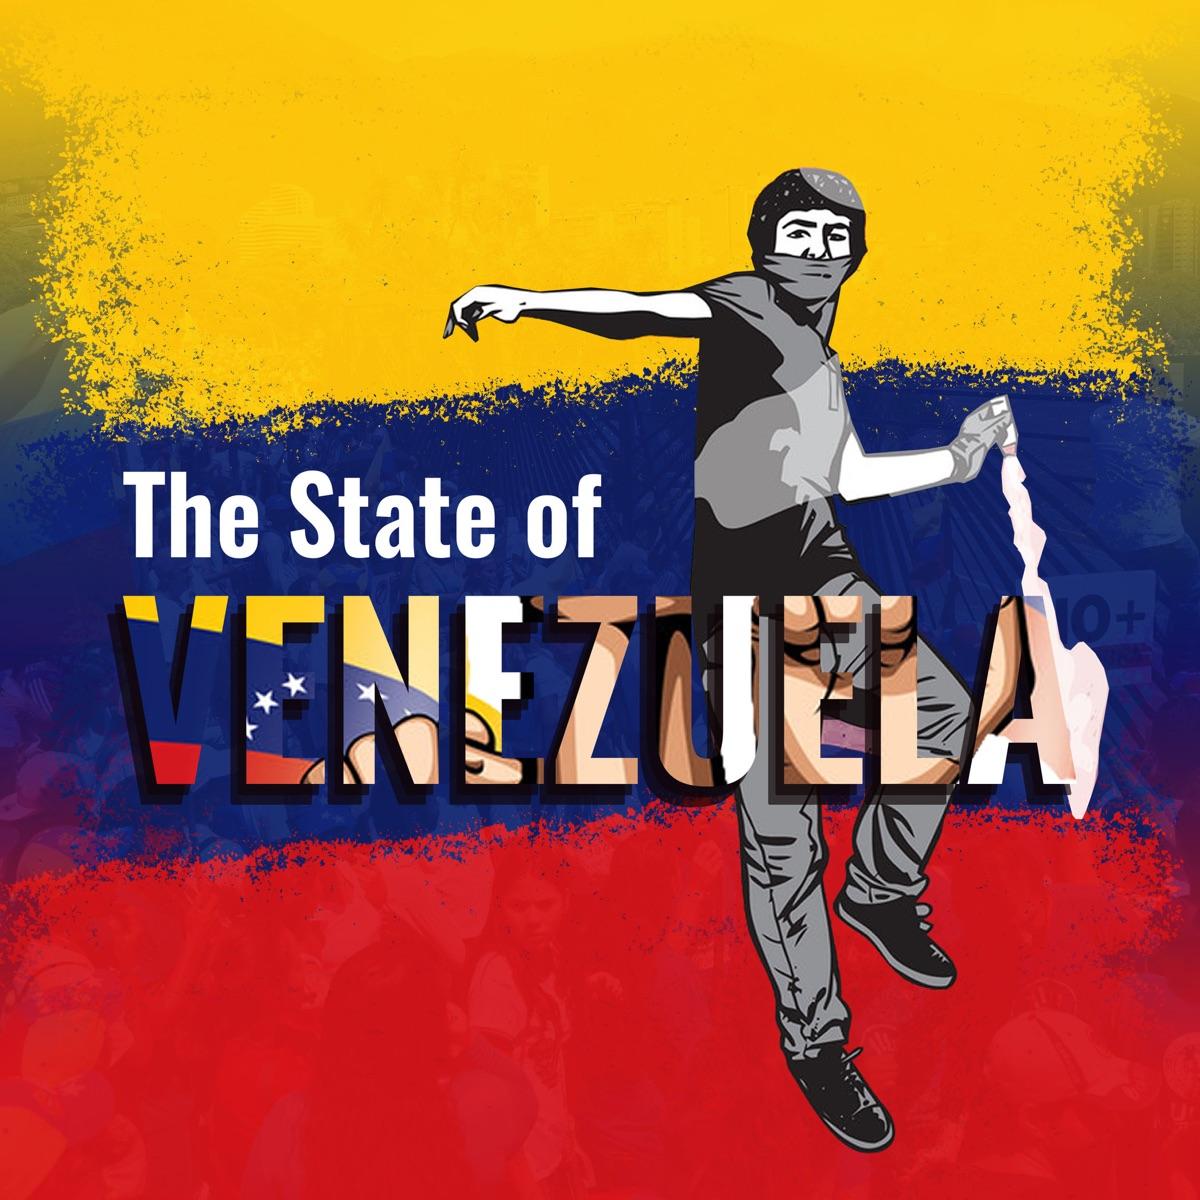 The State of Venezuela